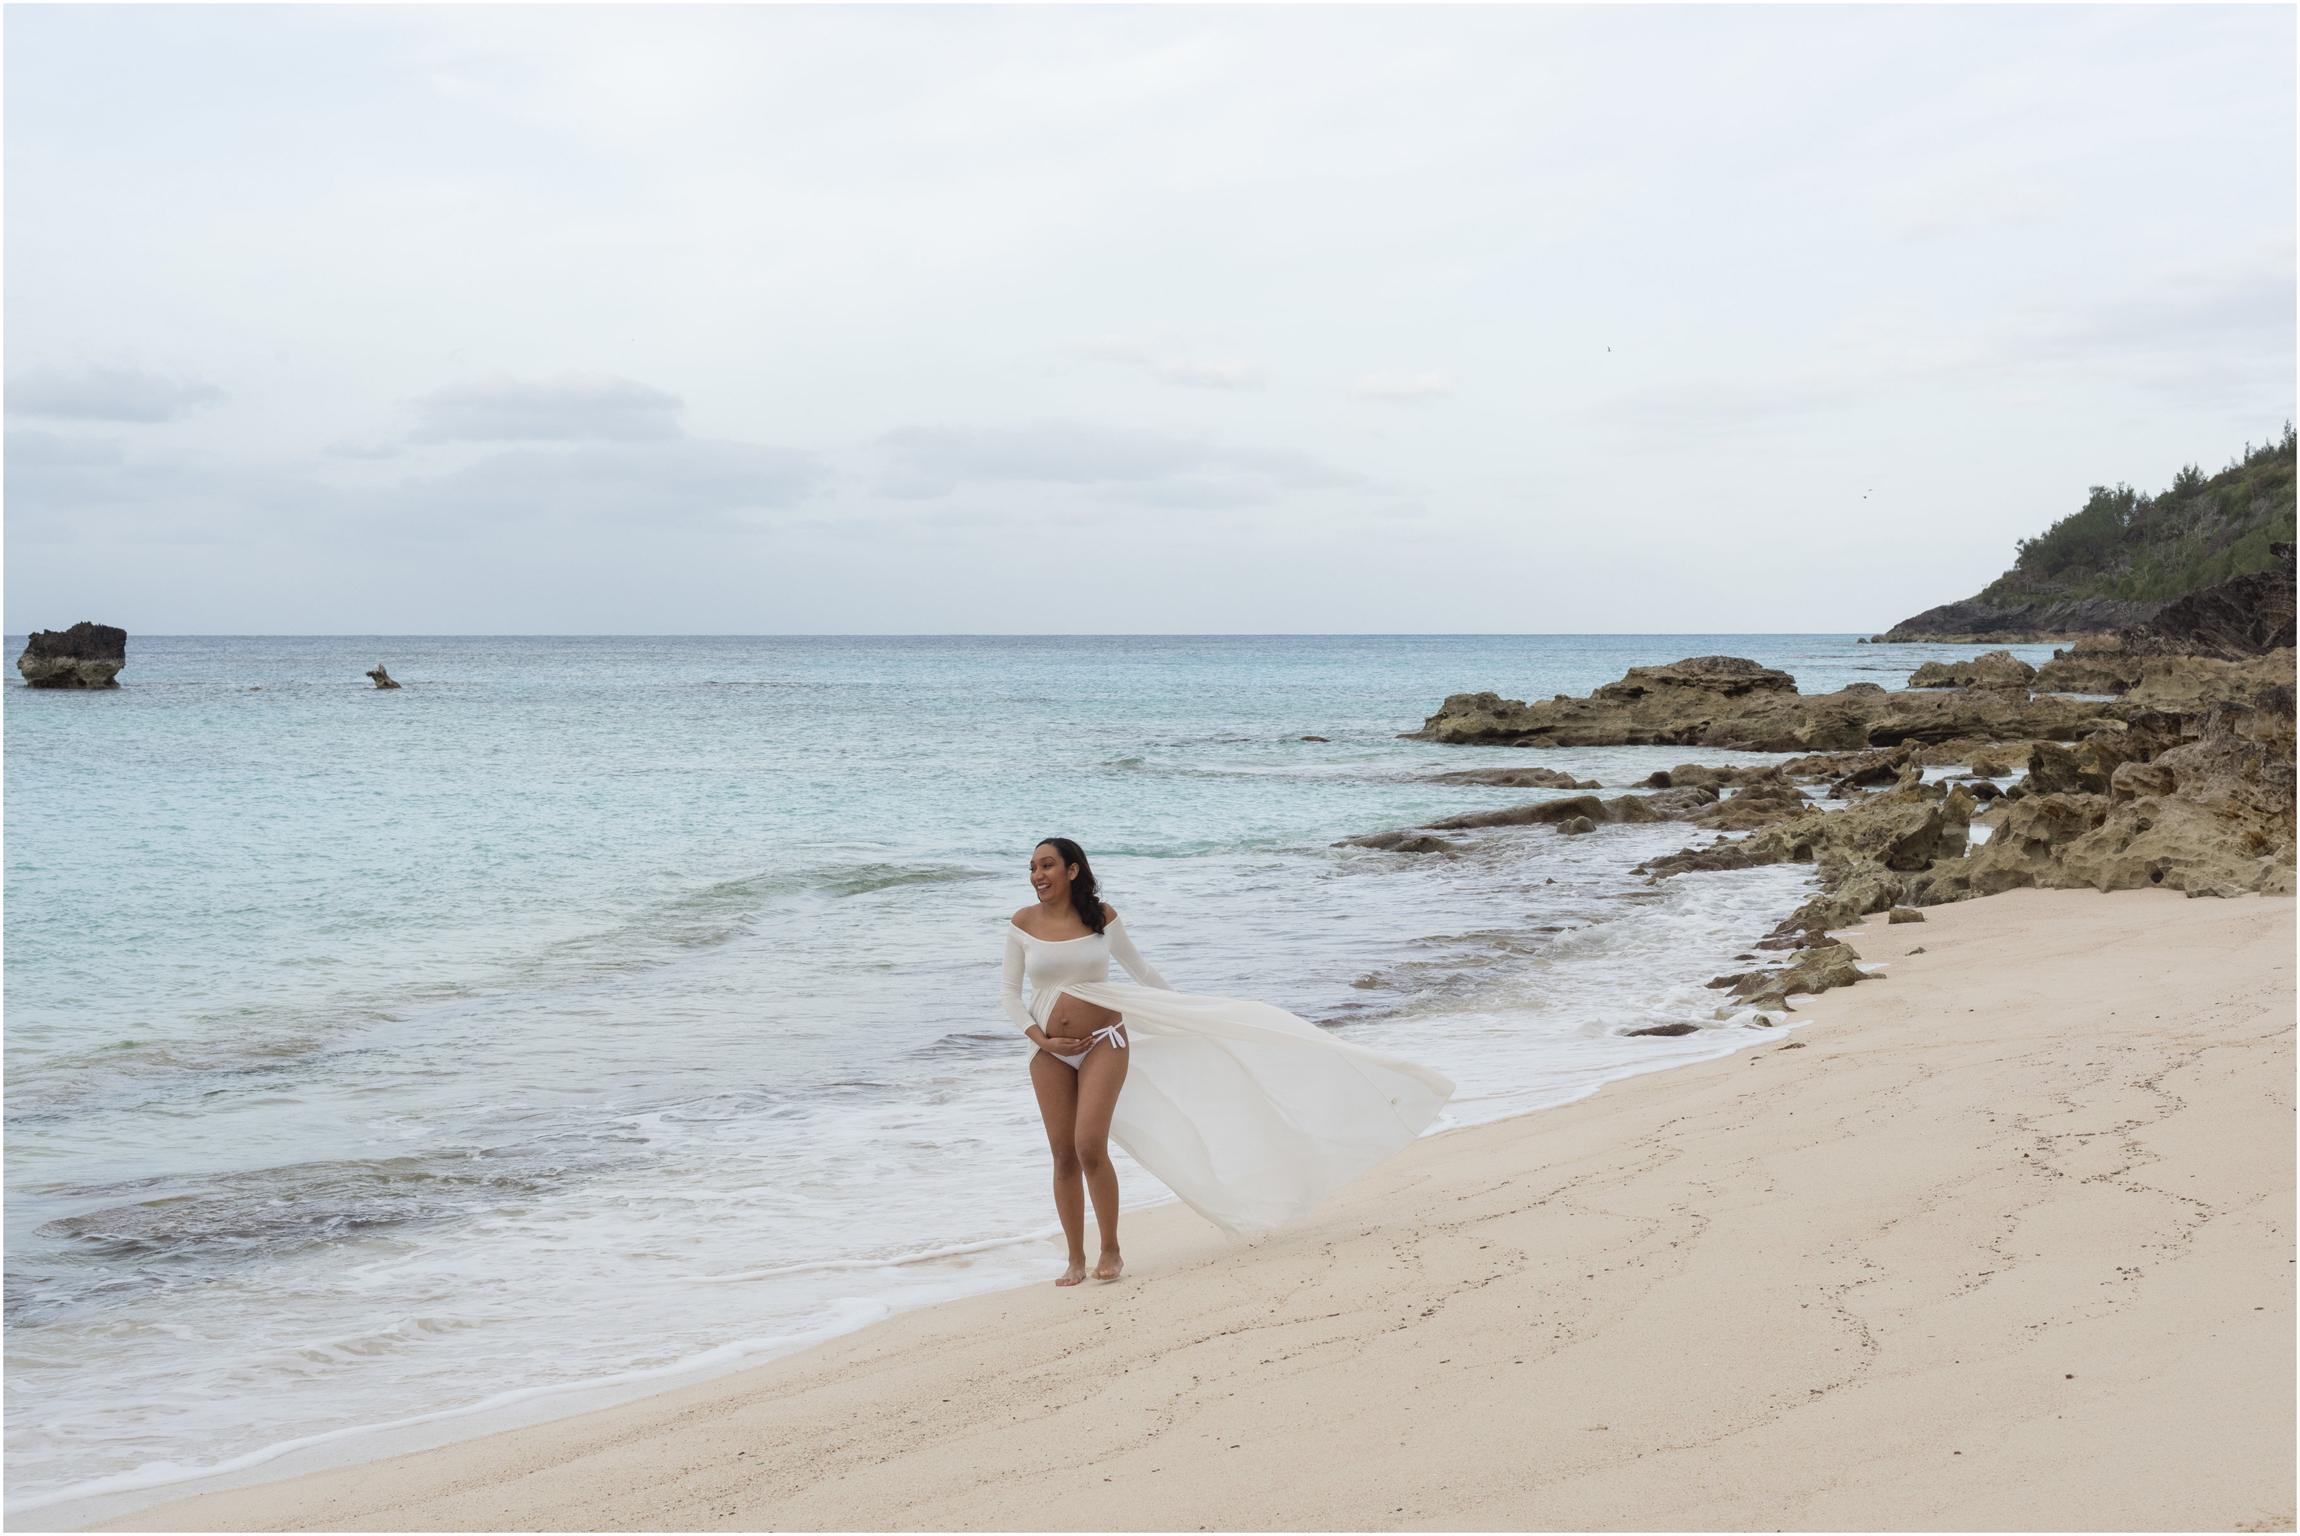 ©FianderFoto_Bermuda Maternity Photographer_Church Bay Beach_Tiffany_008.jpg